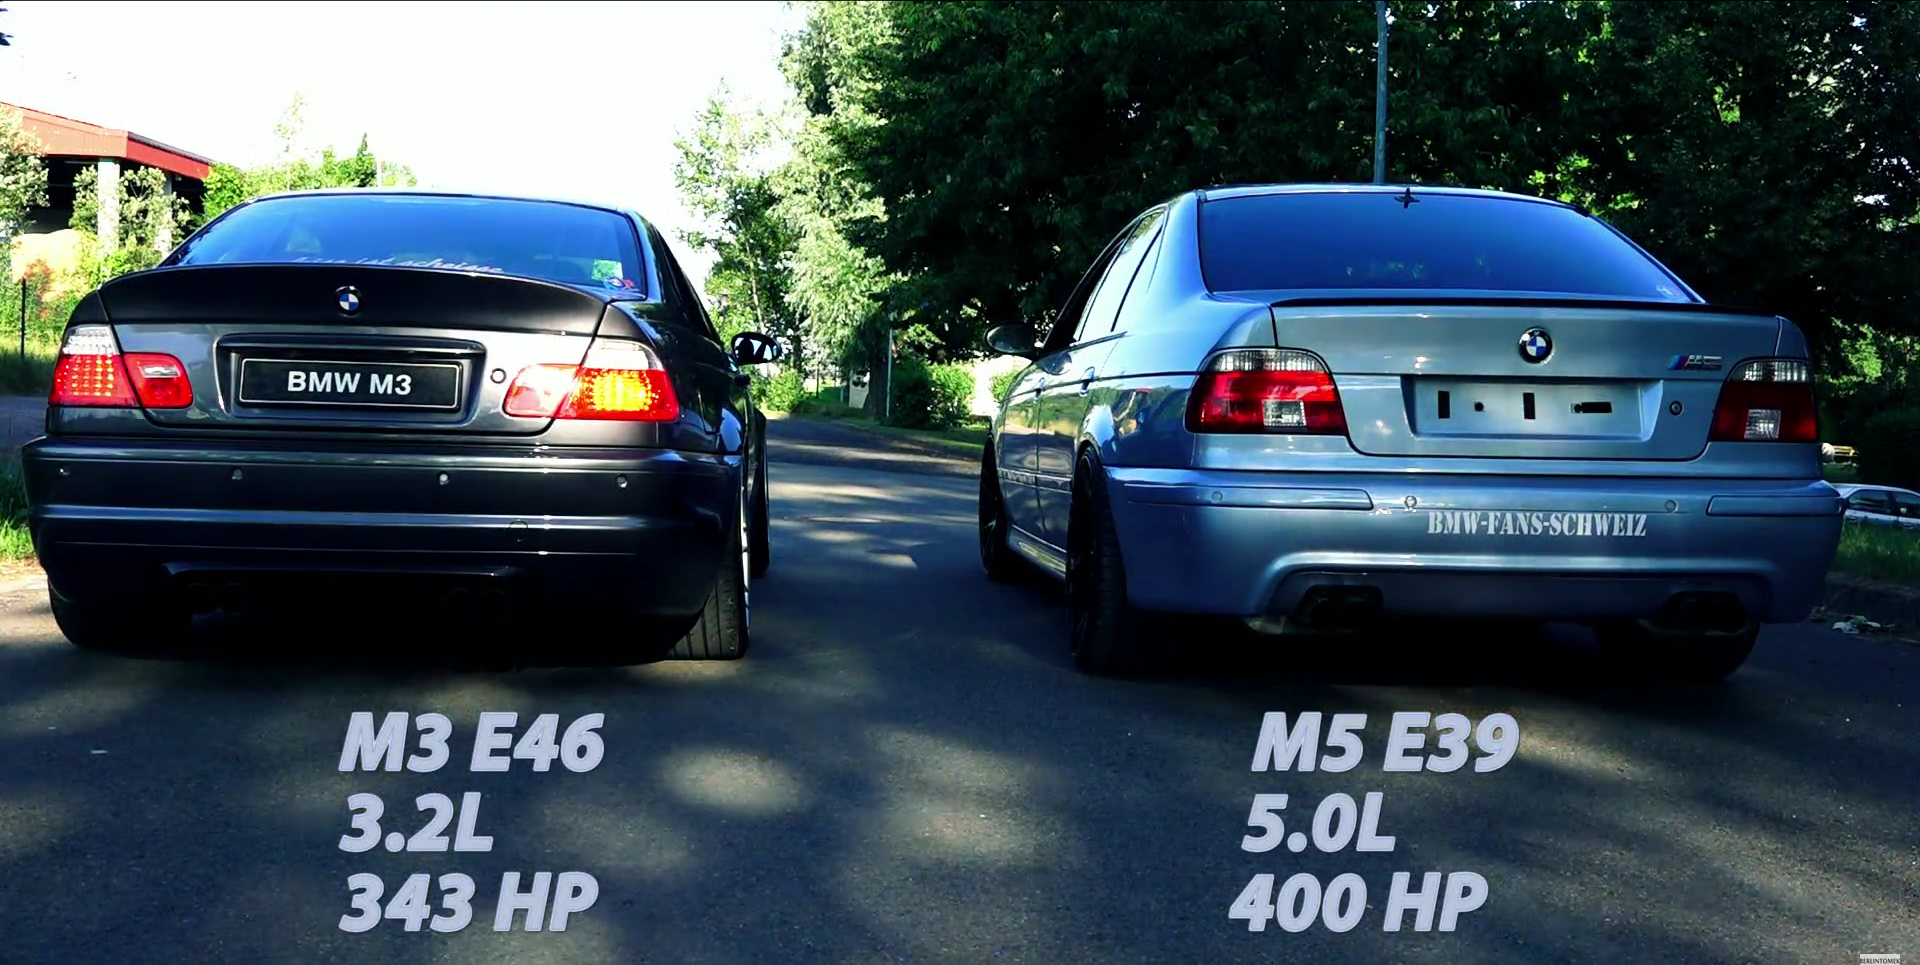 exhaust showdown bmw e46 m3 versus bmw e39 m5 autoevolution. Black Bedroom Furniture Sets. Home Design Ideas